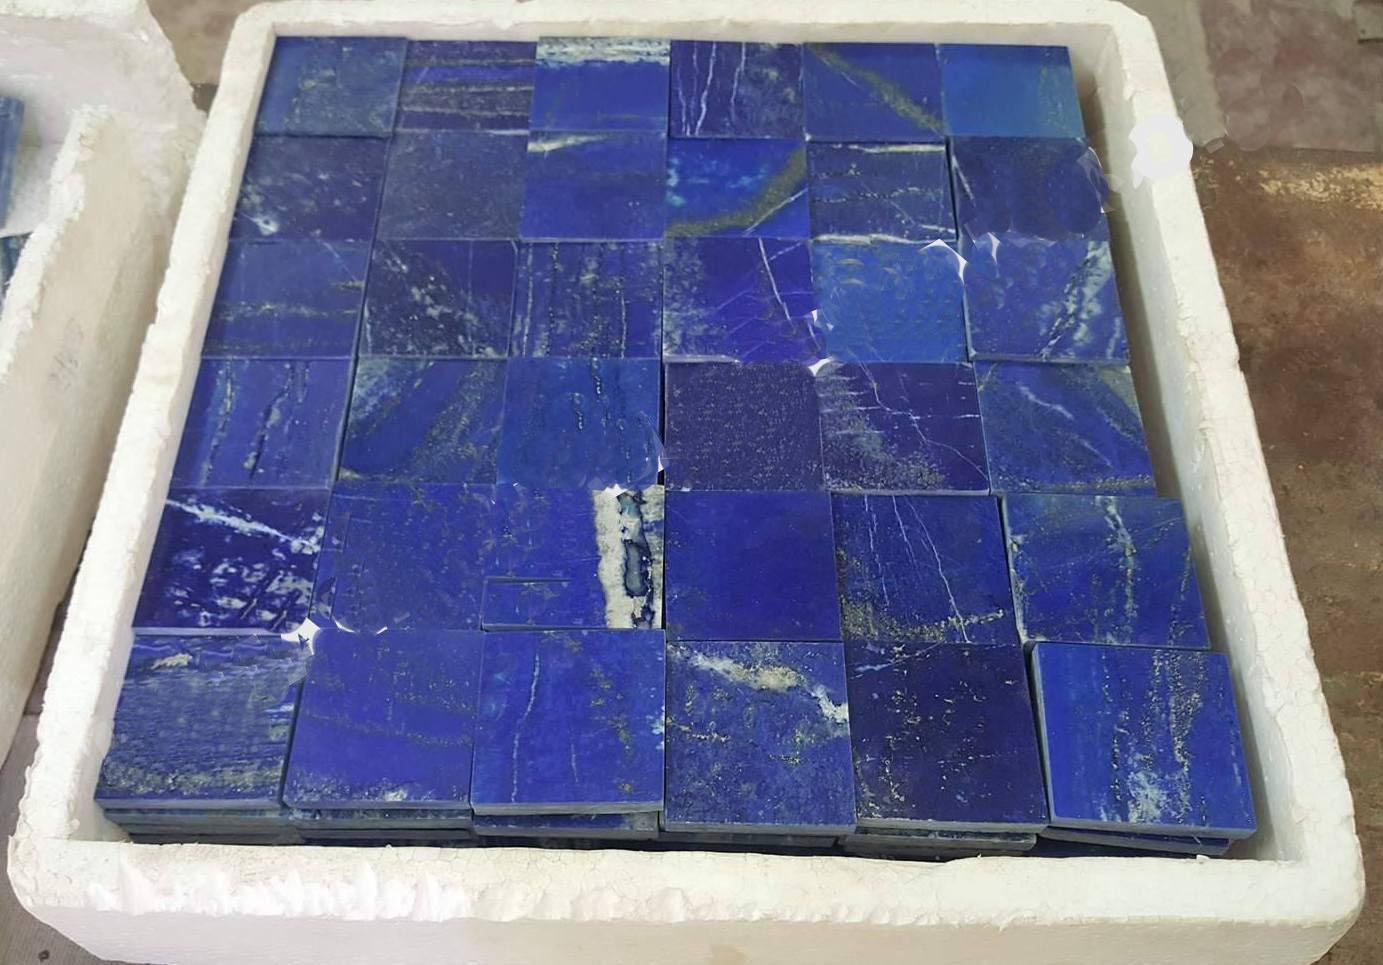 lapiz mosaic tiles